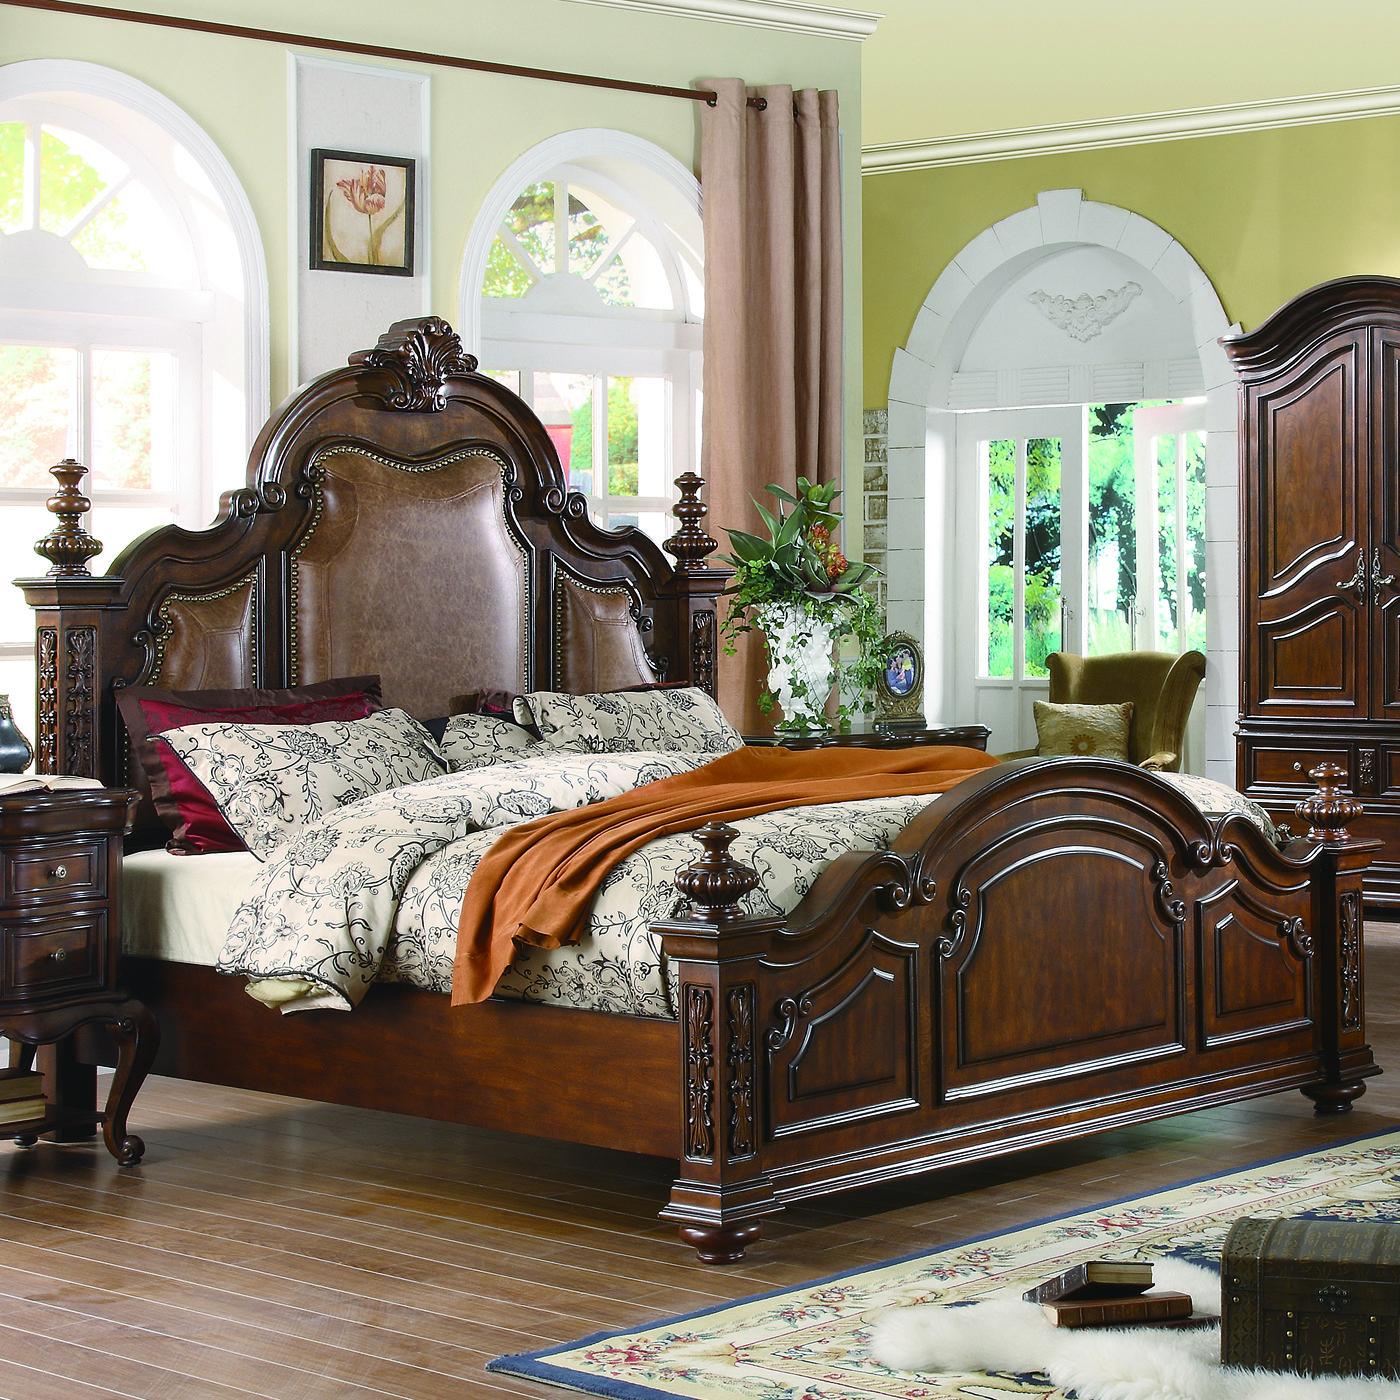 Kittles Bedroom Furniture Yuan Tai Furniture Rs527 Ramses Bed Master Suite Pinterest